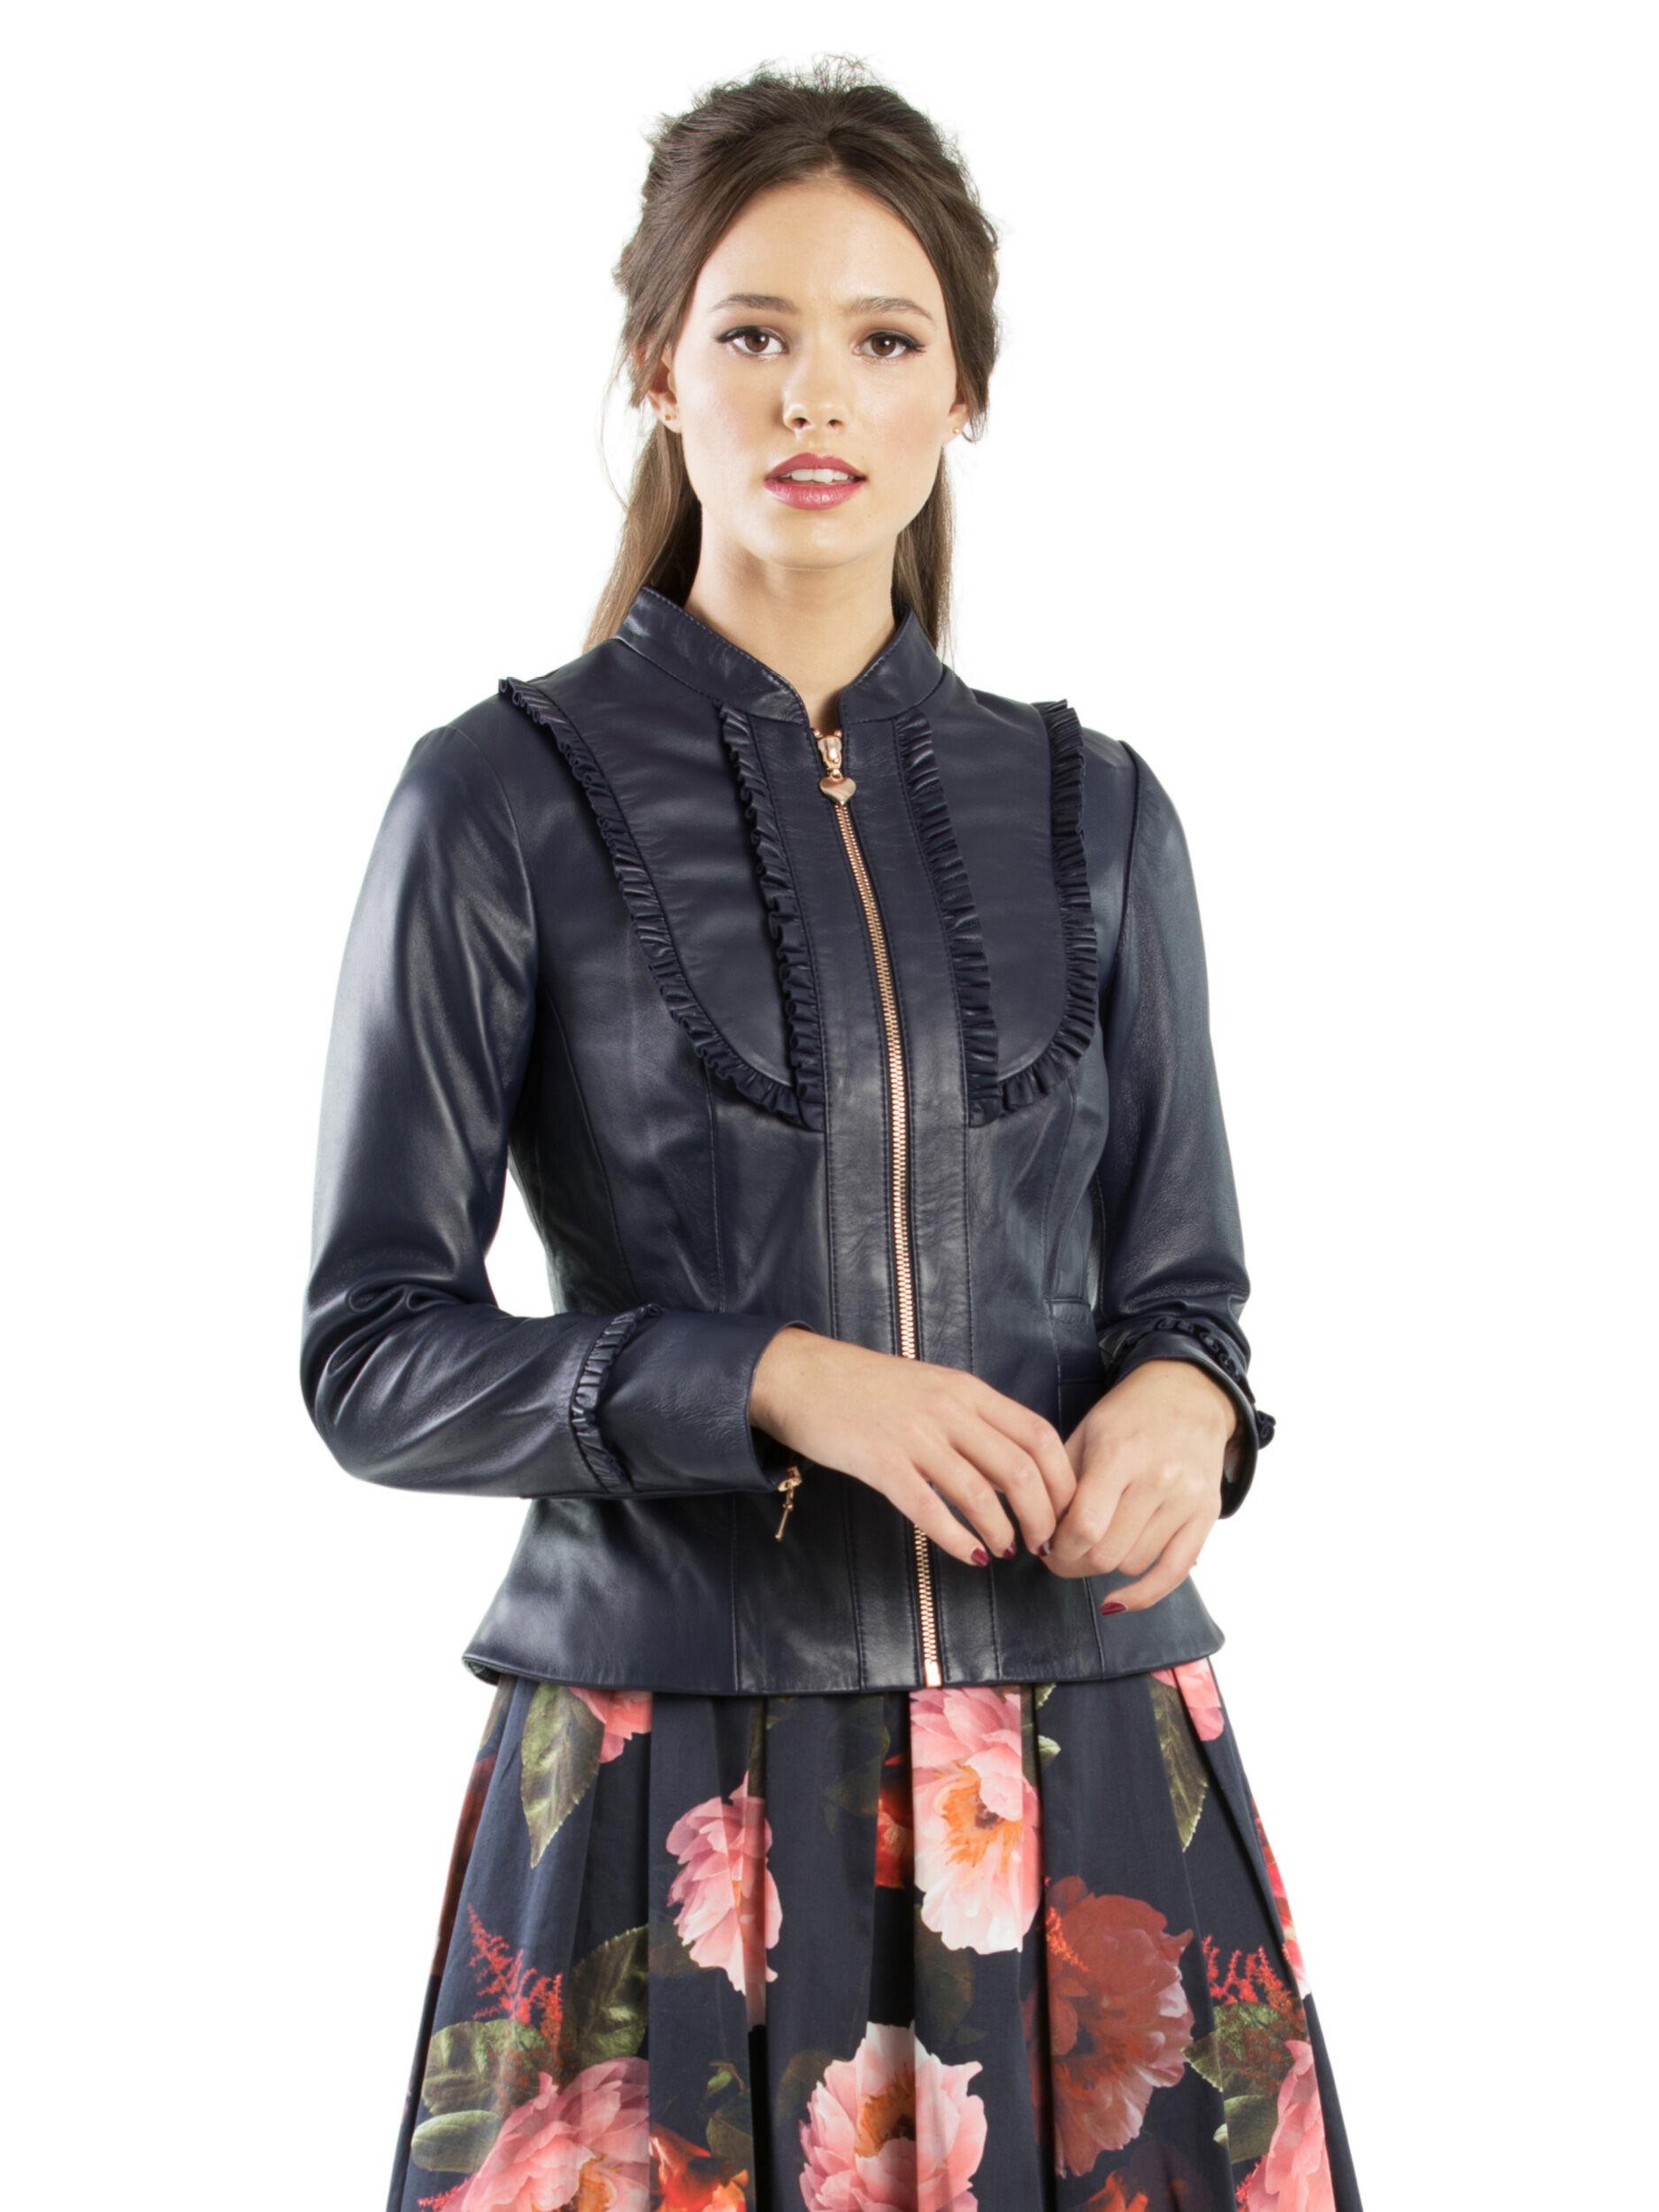 Rizzo Leather Jacket